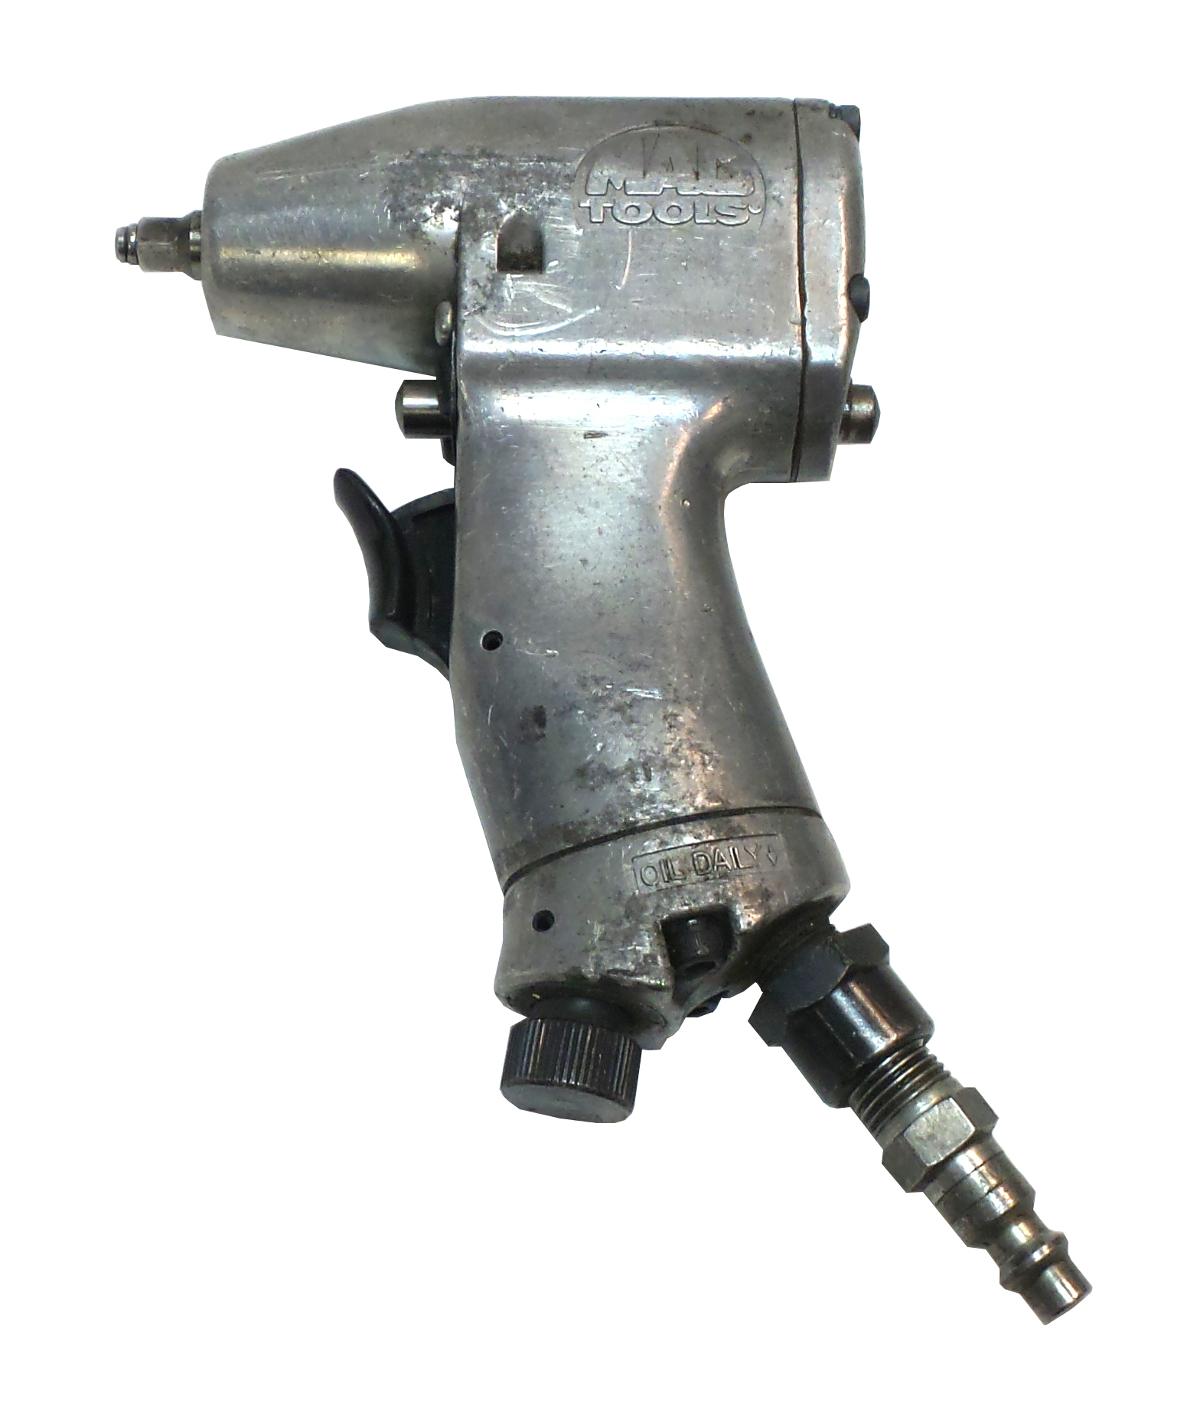 Mac Air tool AW850 IMPACT